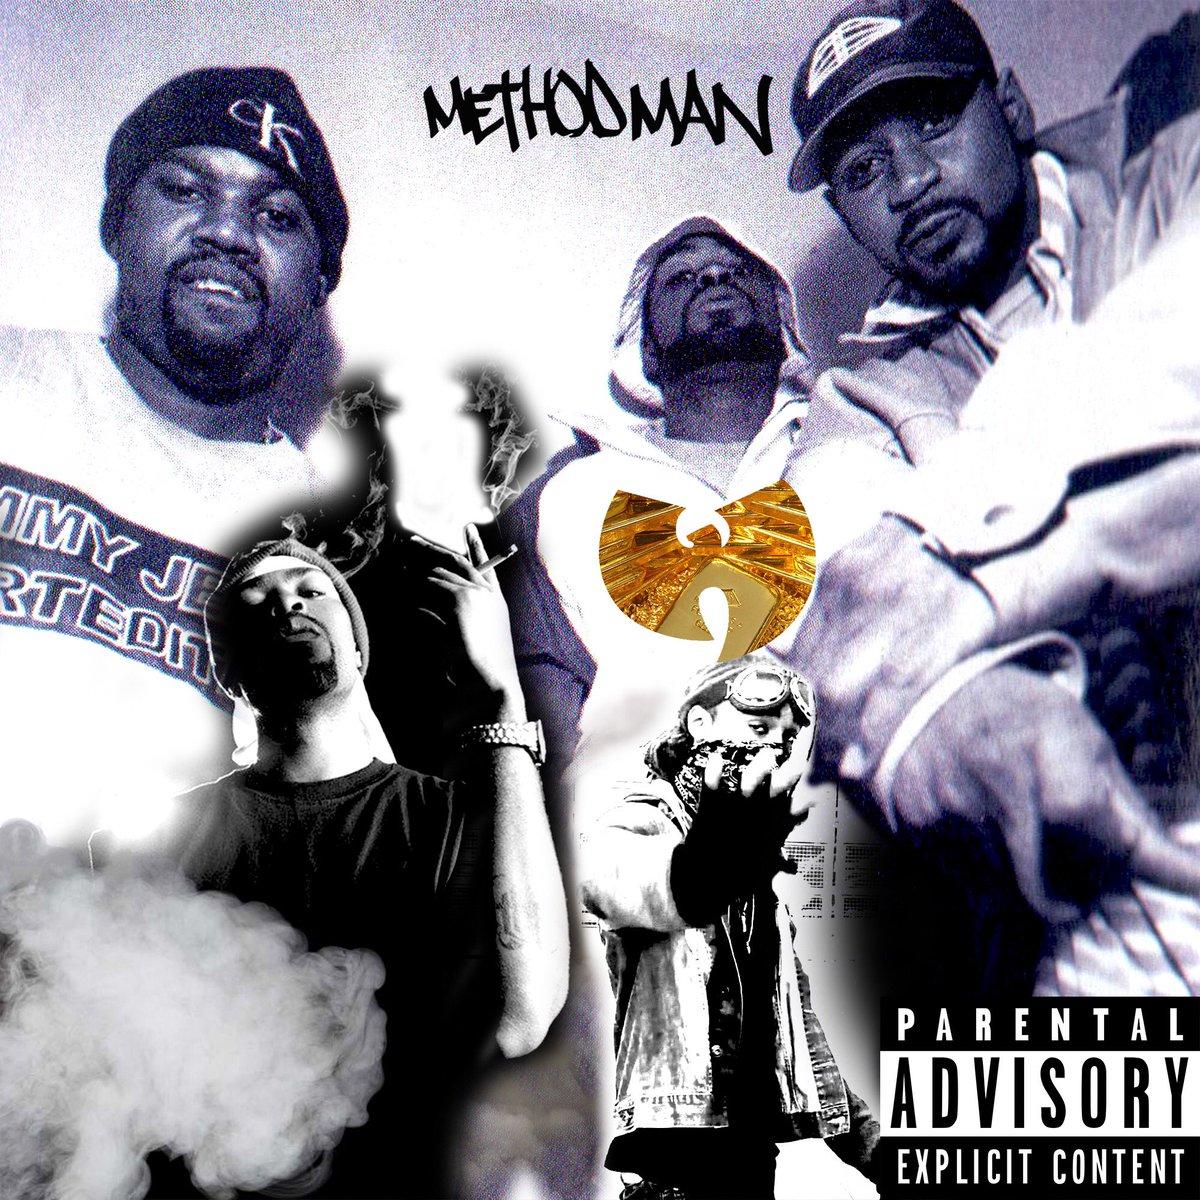 GhostFace (New Method Man) #WuTang #MethodMan #Ghostface 👻 #Hwoarang #DatPiff #MyMixtapez #Spinrilla #Youtube #Soundcloud #HipHop #Rap #Tekken #Trap #Tekken3 #WorldStarHipHop https://t.co/c4eLpcWw7i